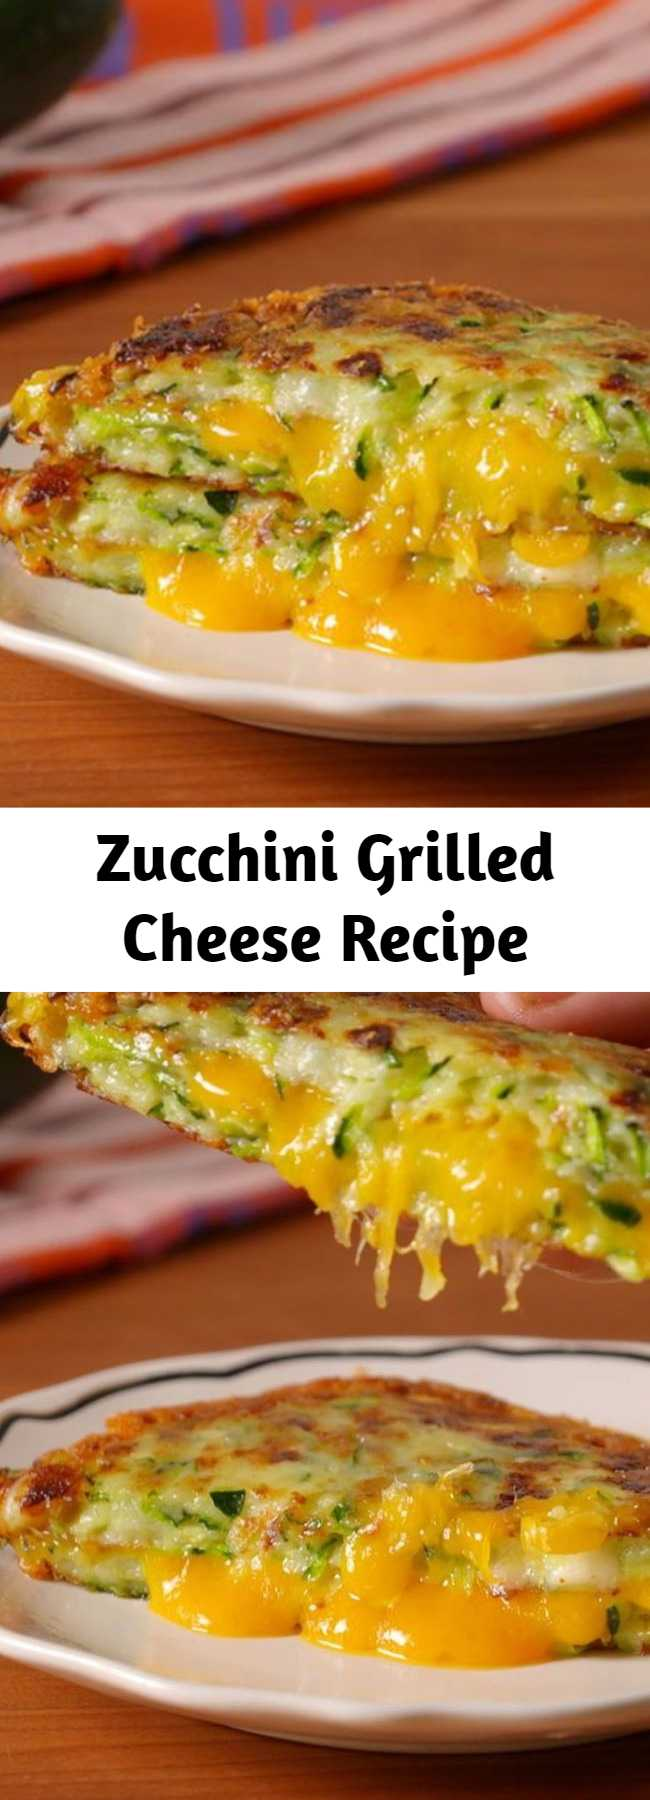 Zucchini Grilled Cheese Recipe - Zucchini is so the new cauliflower. Zucchini Grilled Cheese Is A Low-Carb Dream Come True.